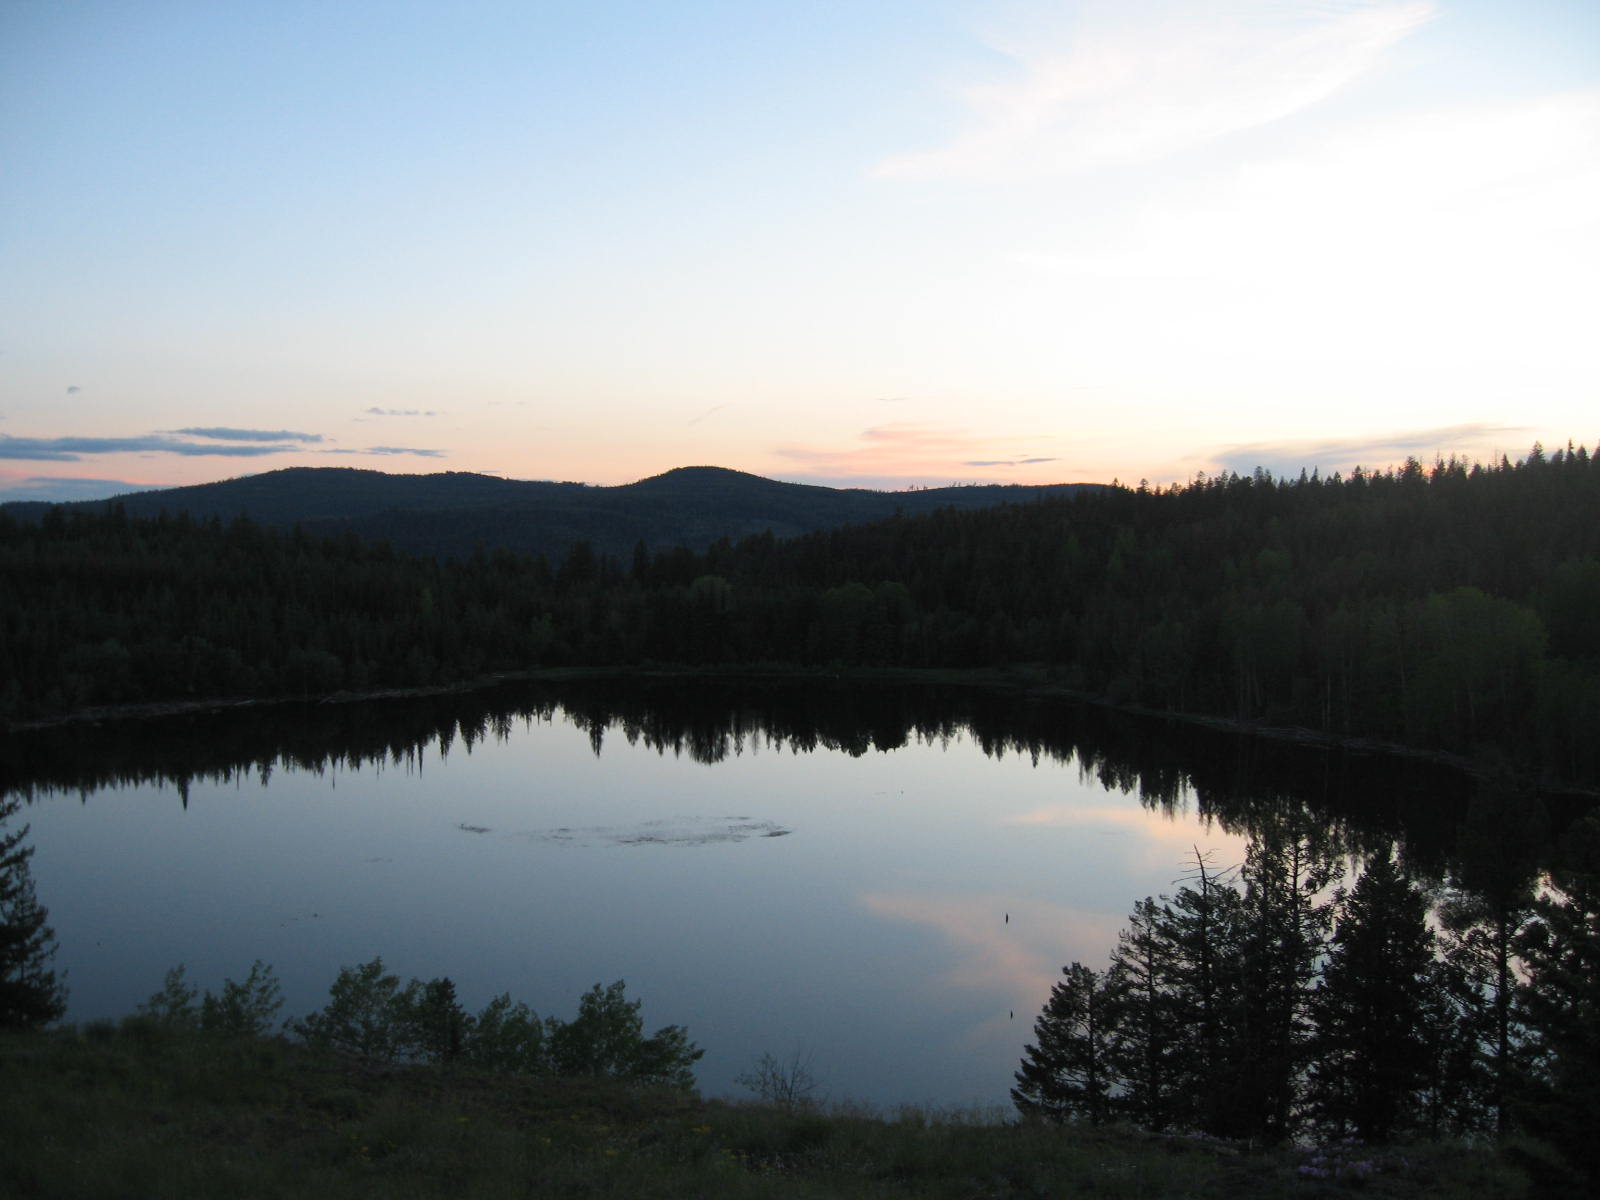 Hayman Lake - Great pic!